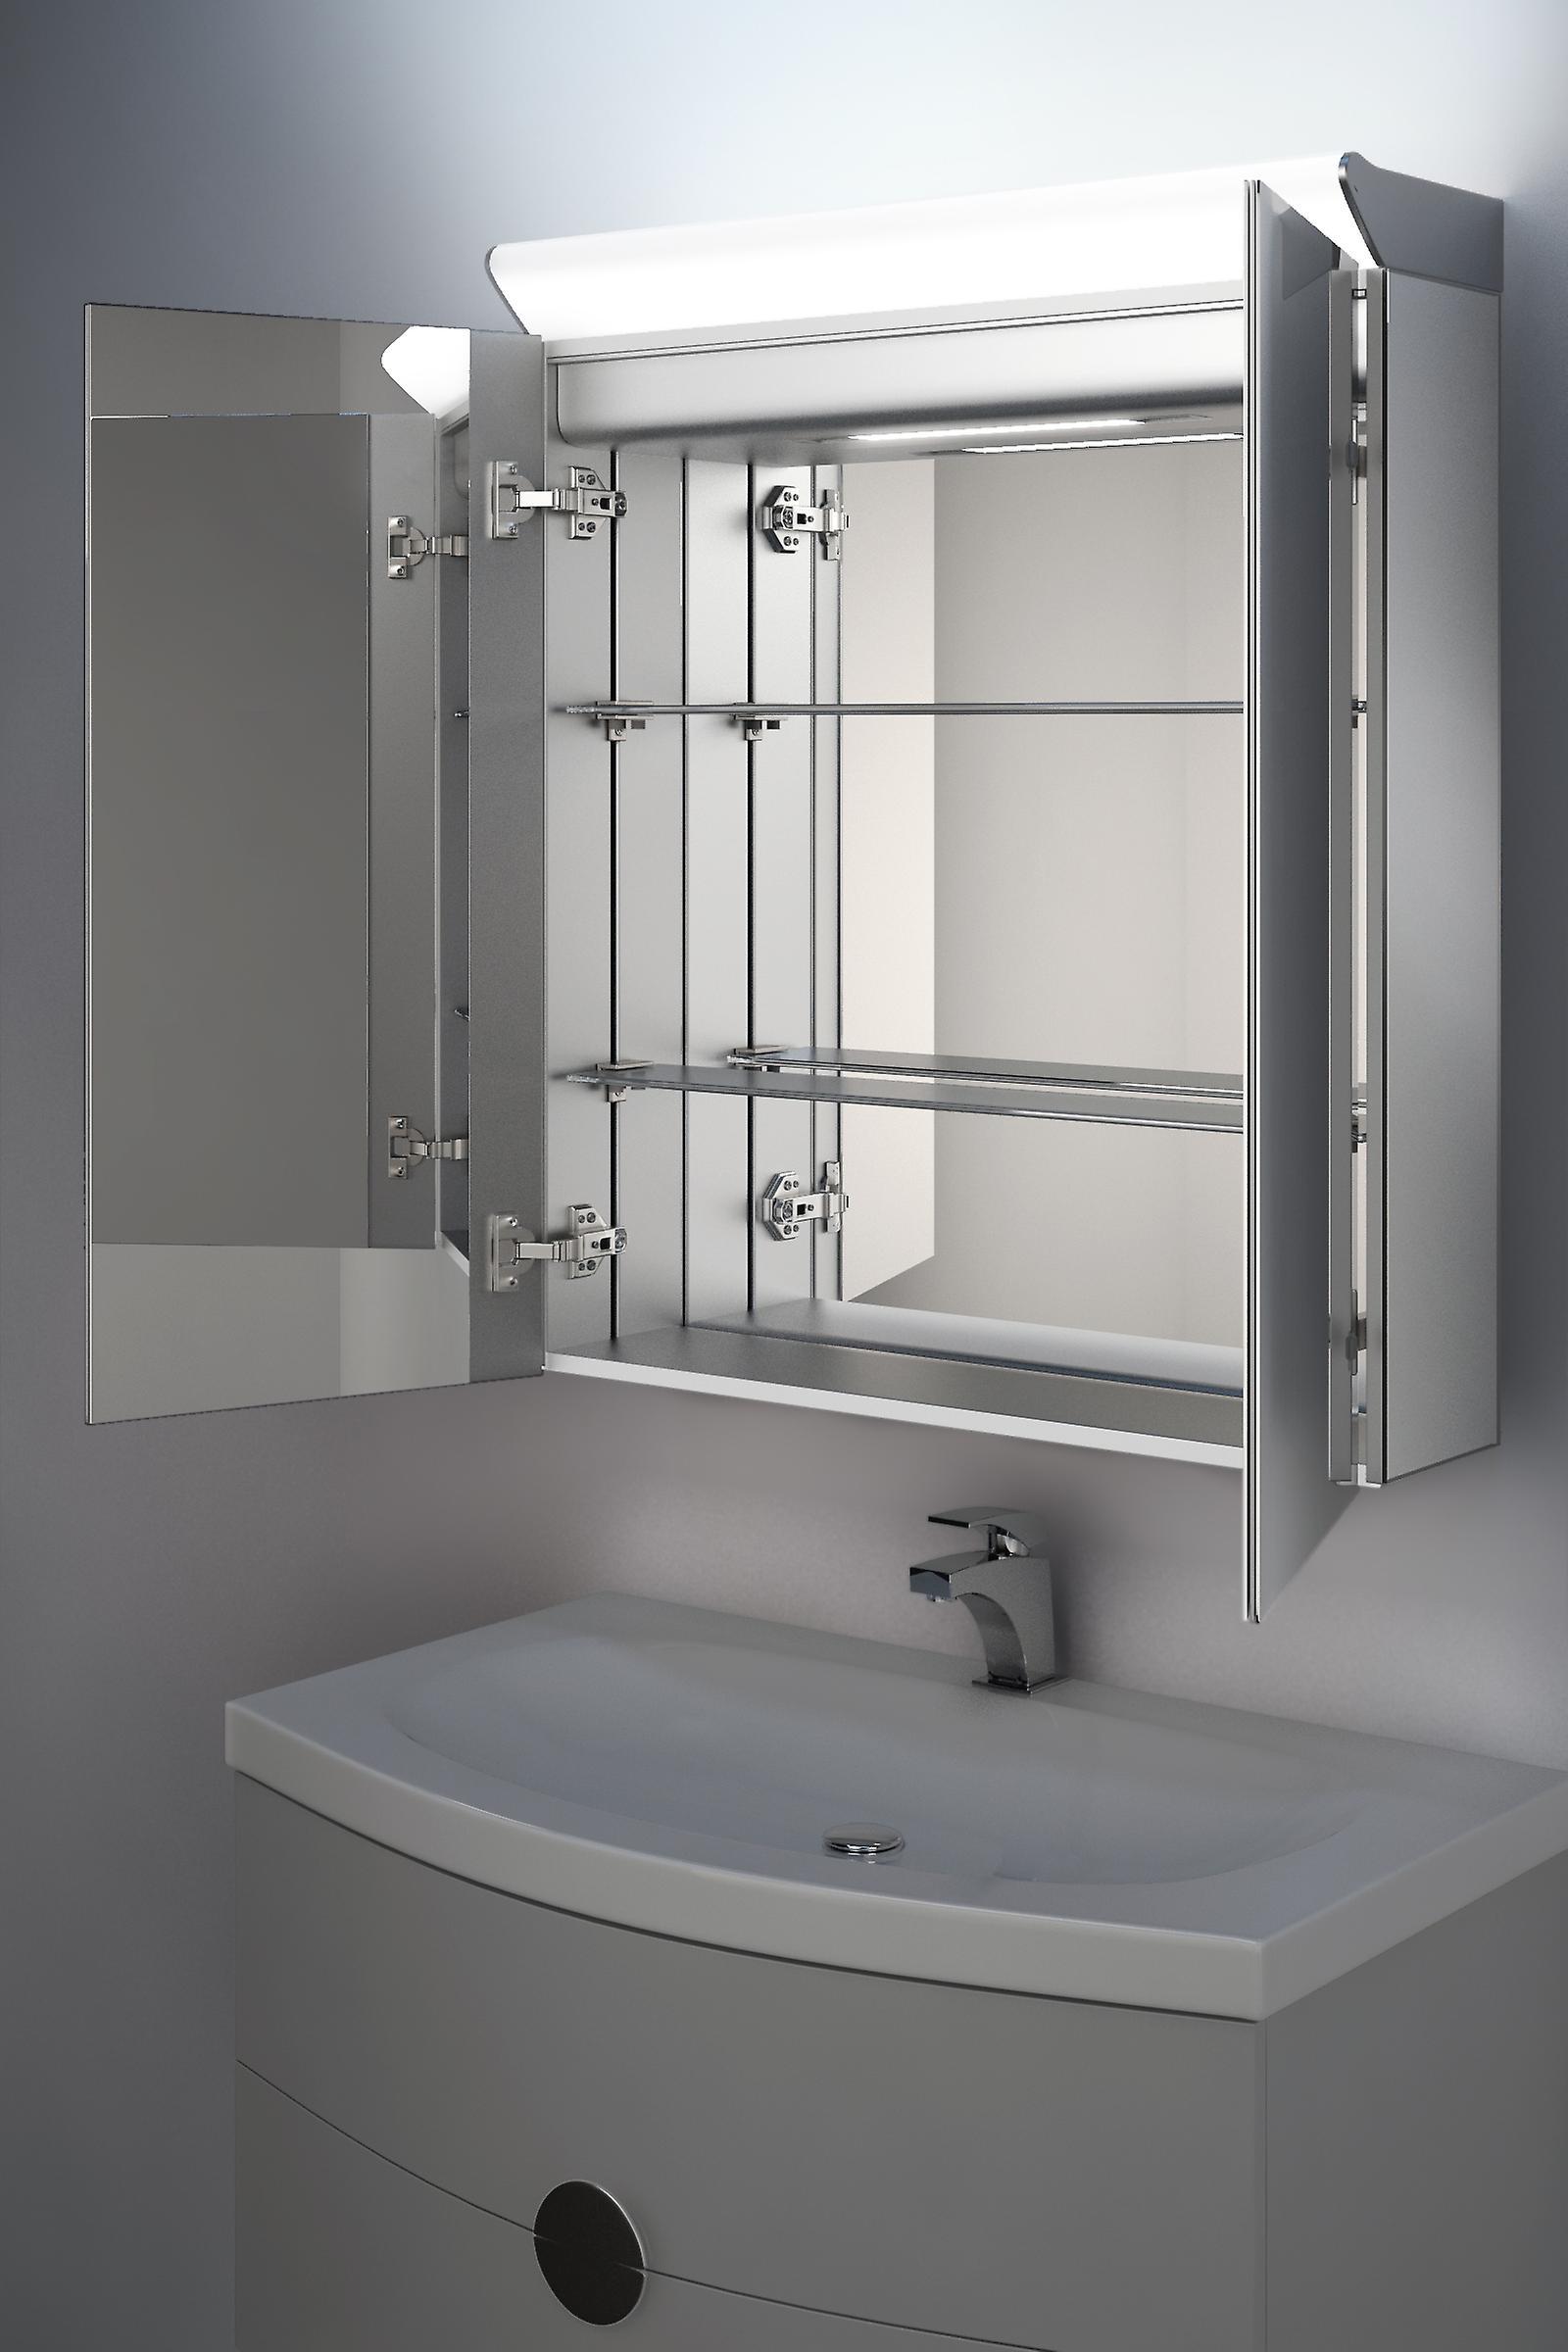 Matar Top Light Diffuser Cabinet with Sensor, Shaver & Demister k500